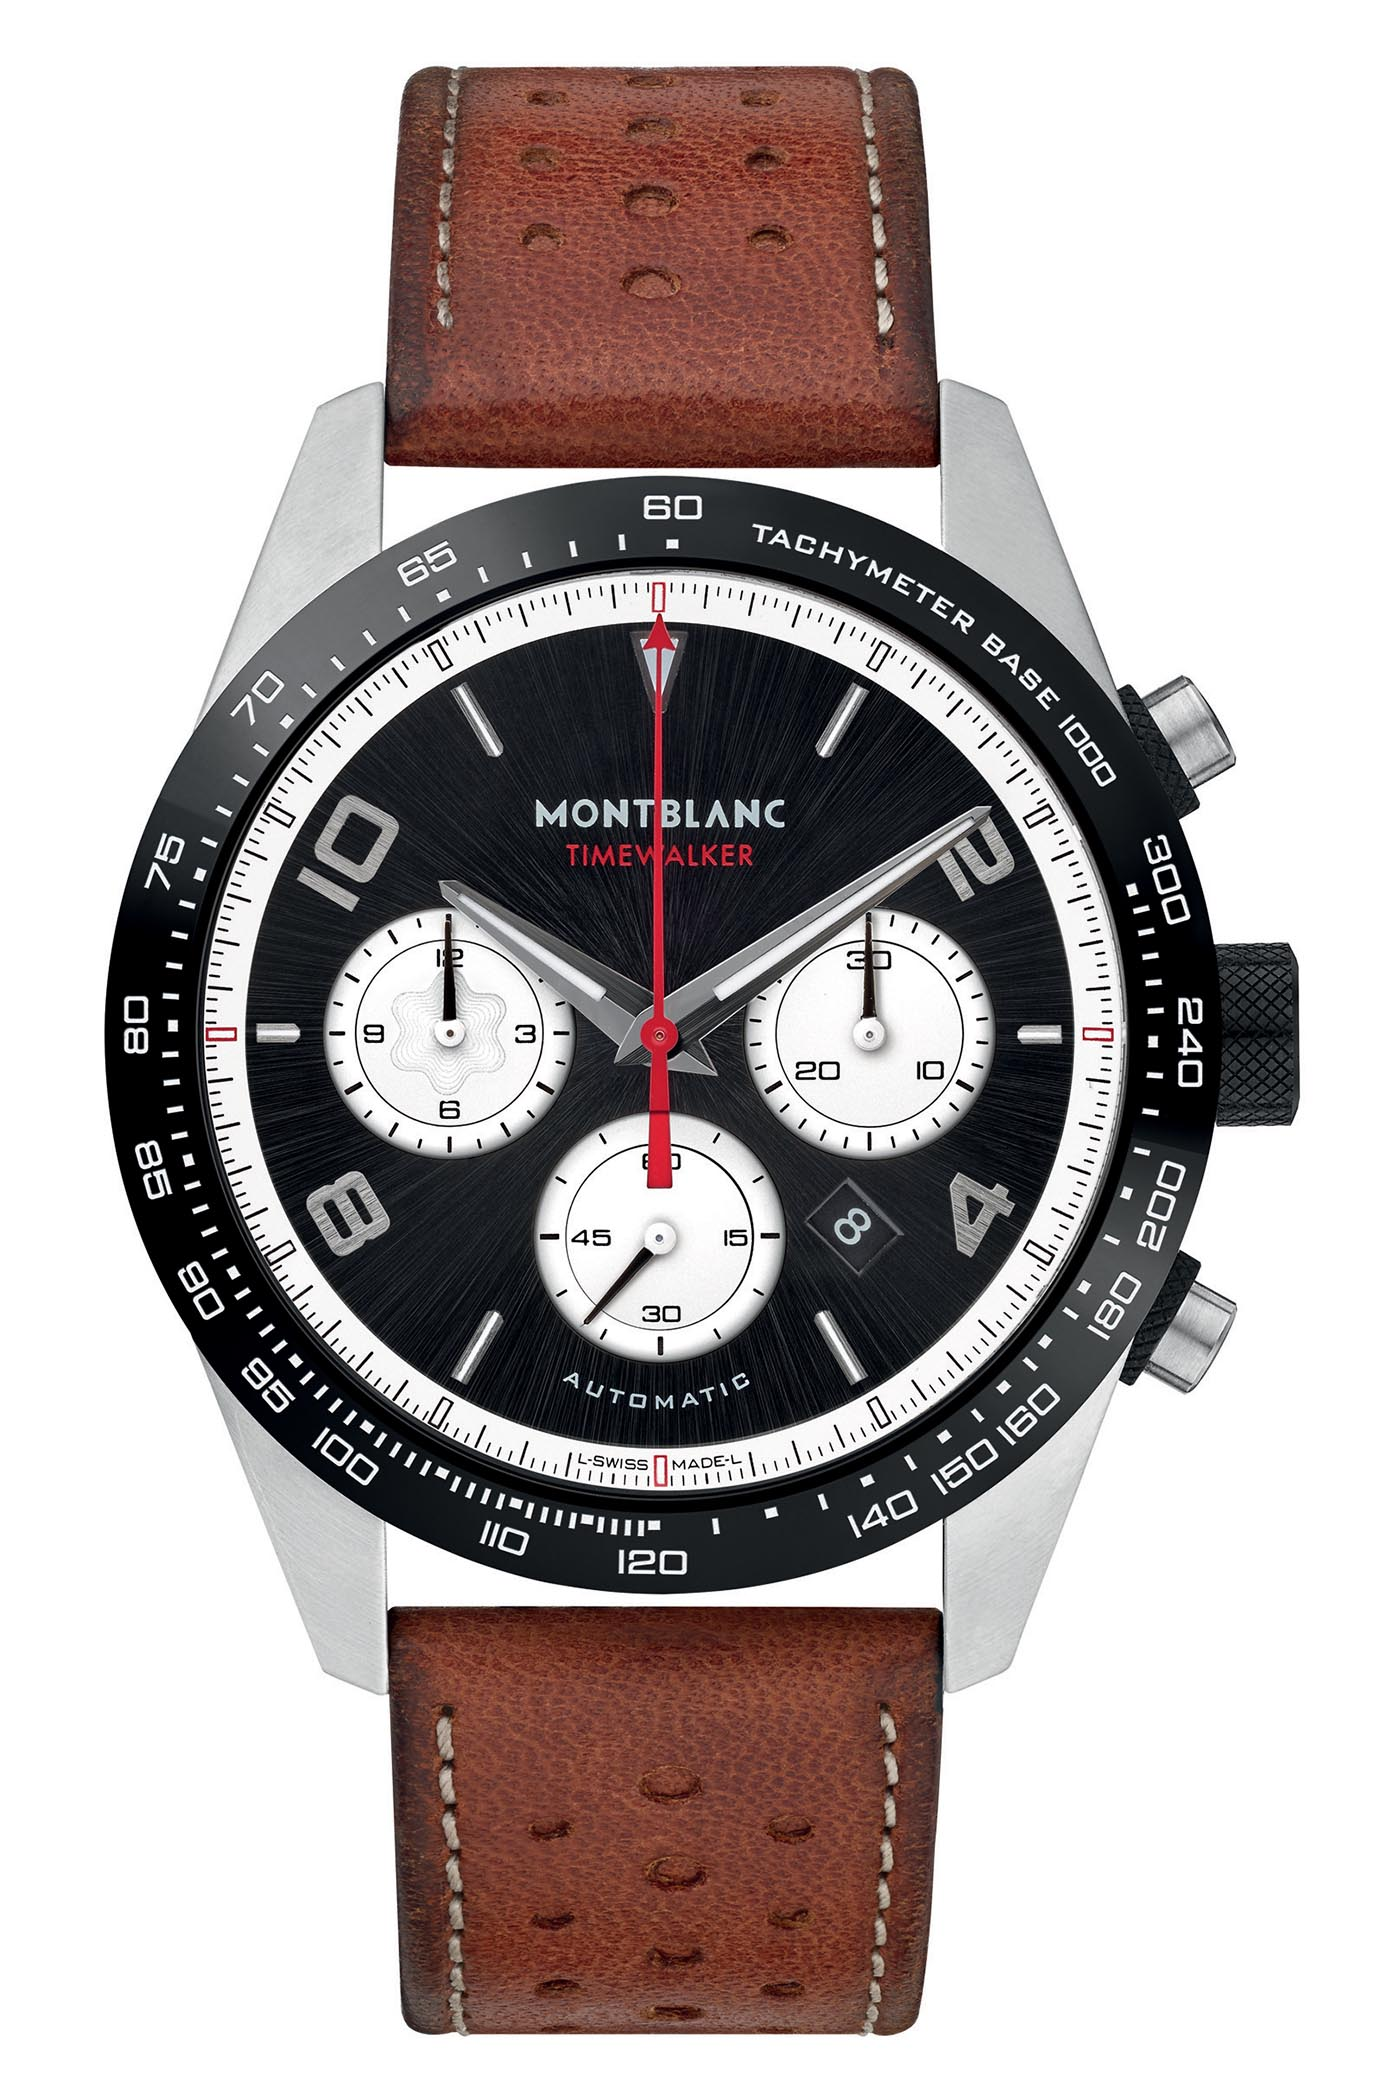 Pre-SIHH 2019 - Montblanc TimeWalker Reverse Panda Chronographs - 4